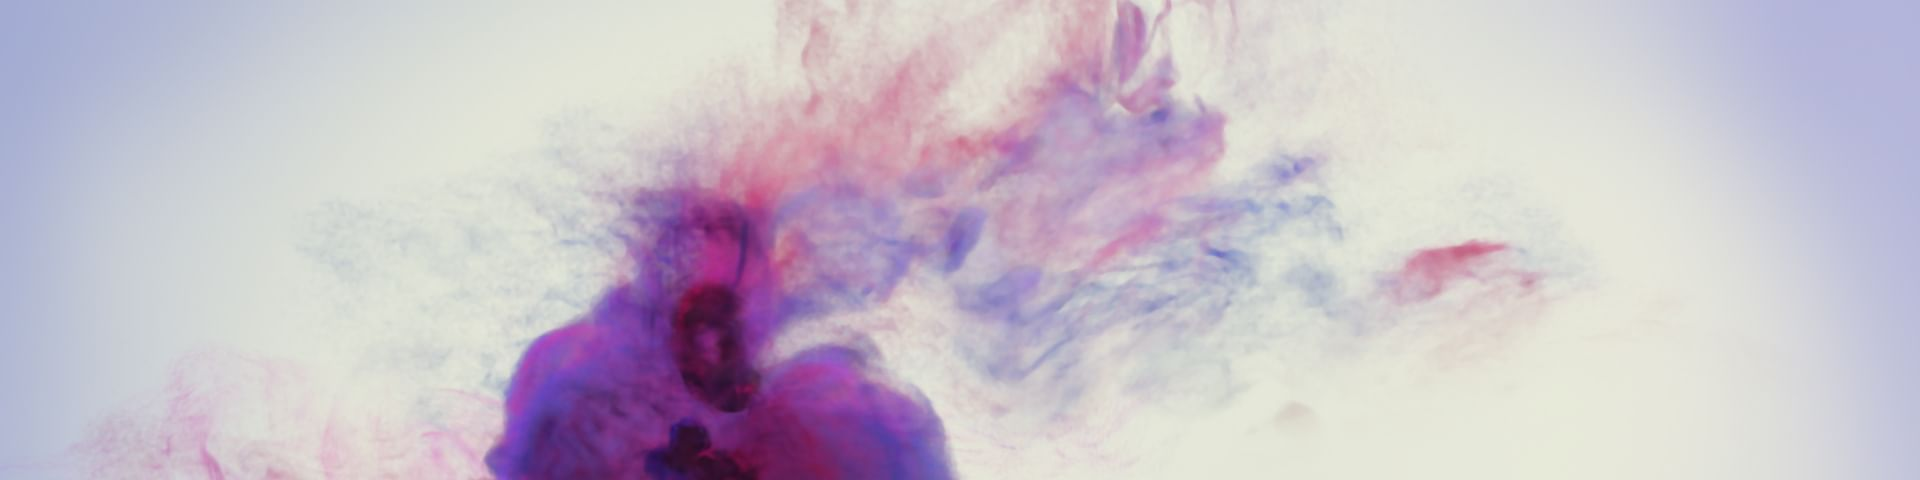 "Eko Supriyanto prezentuje ""Płacz Jailolo"""